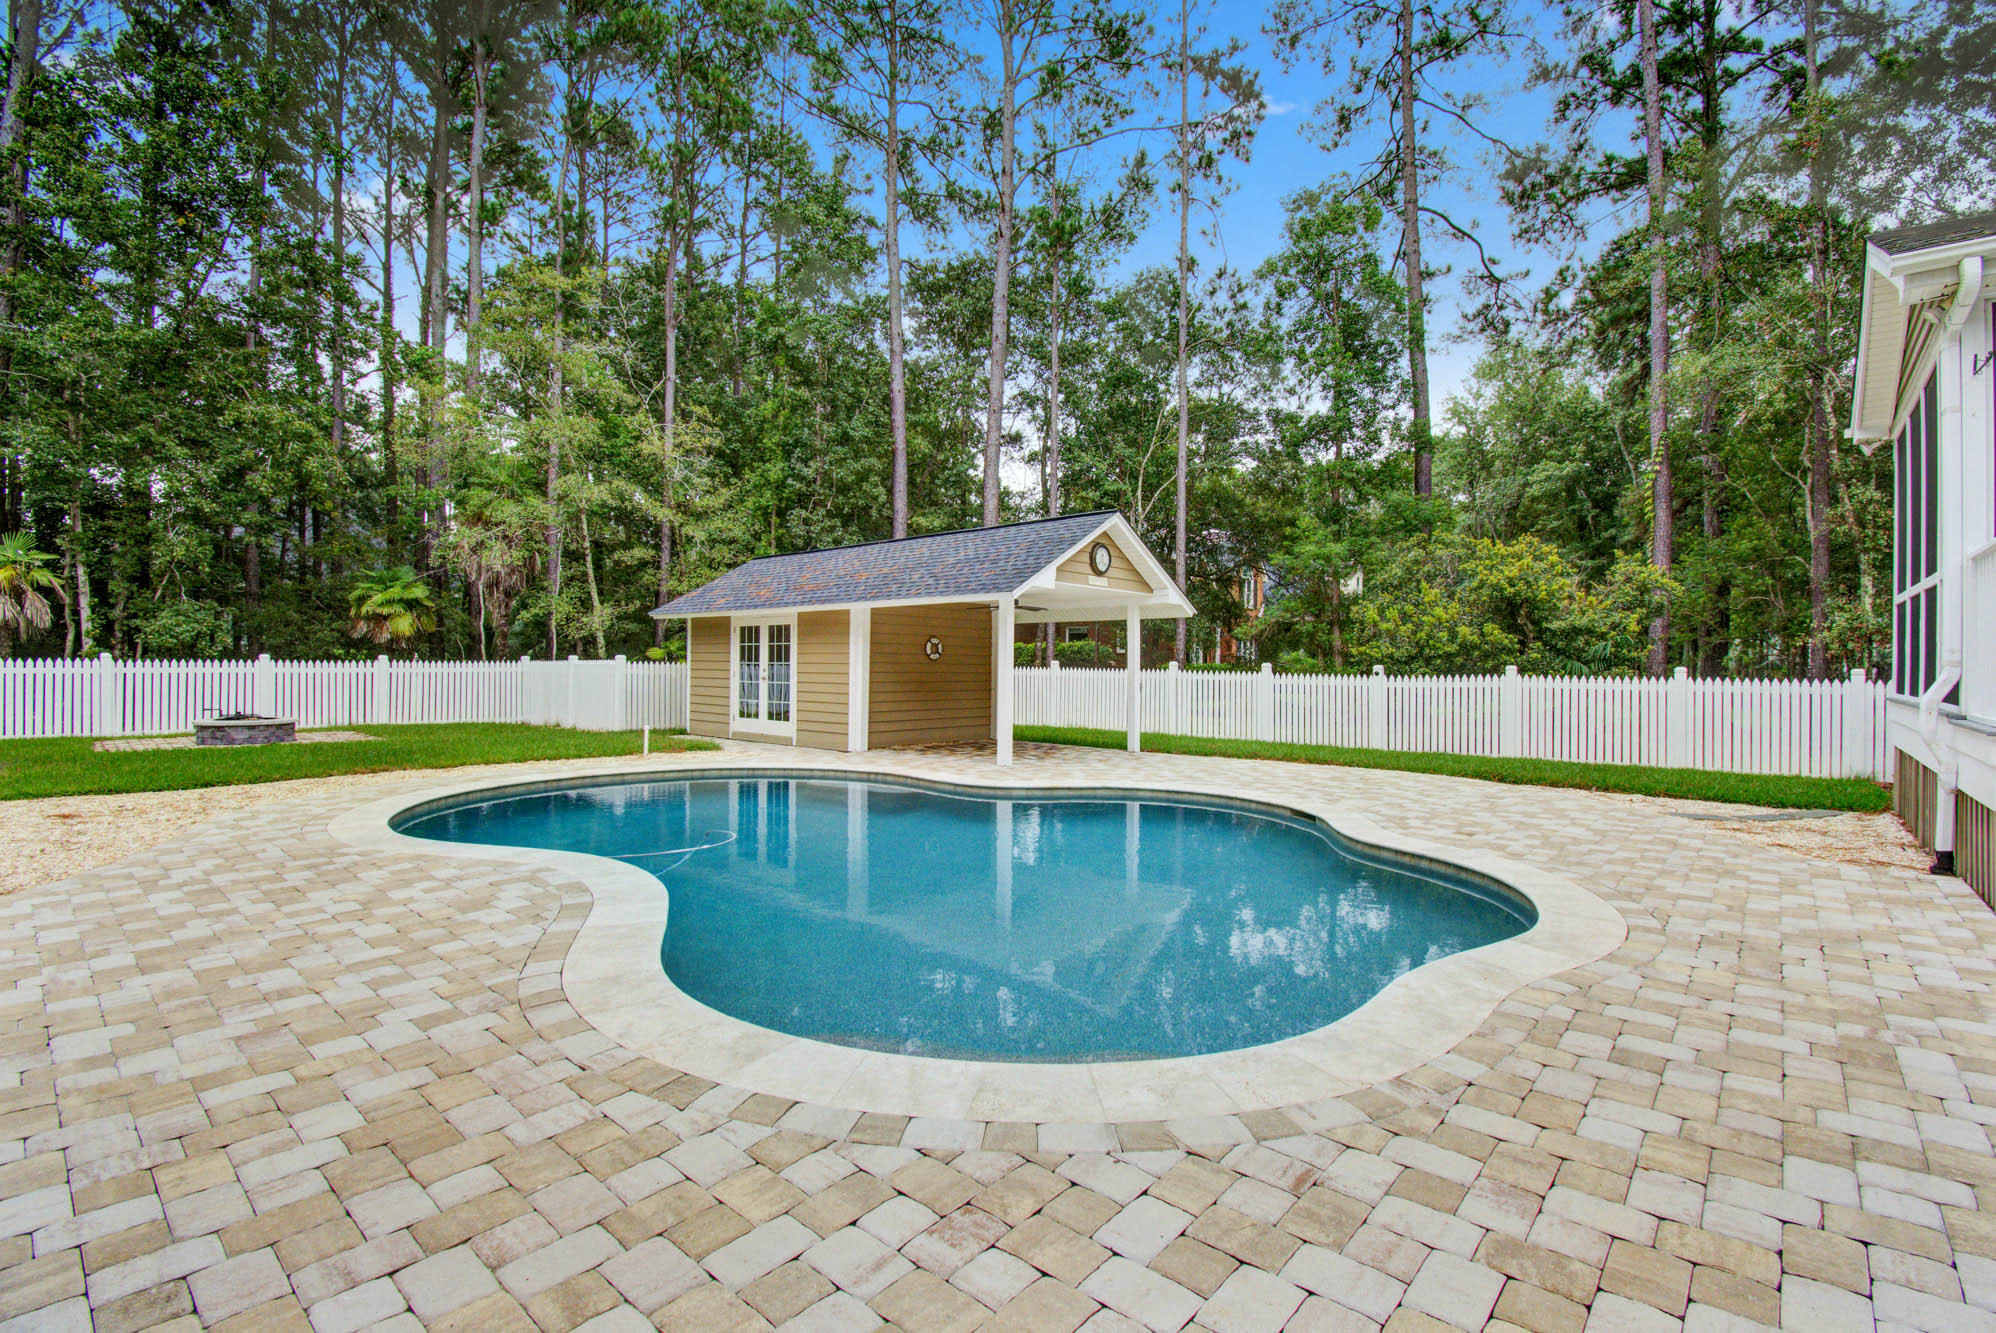 Dunes West Homes For Sale - 3515 Colonel Vanderhorst, Mount Pleasant, SC - 21